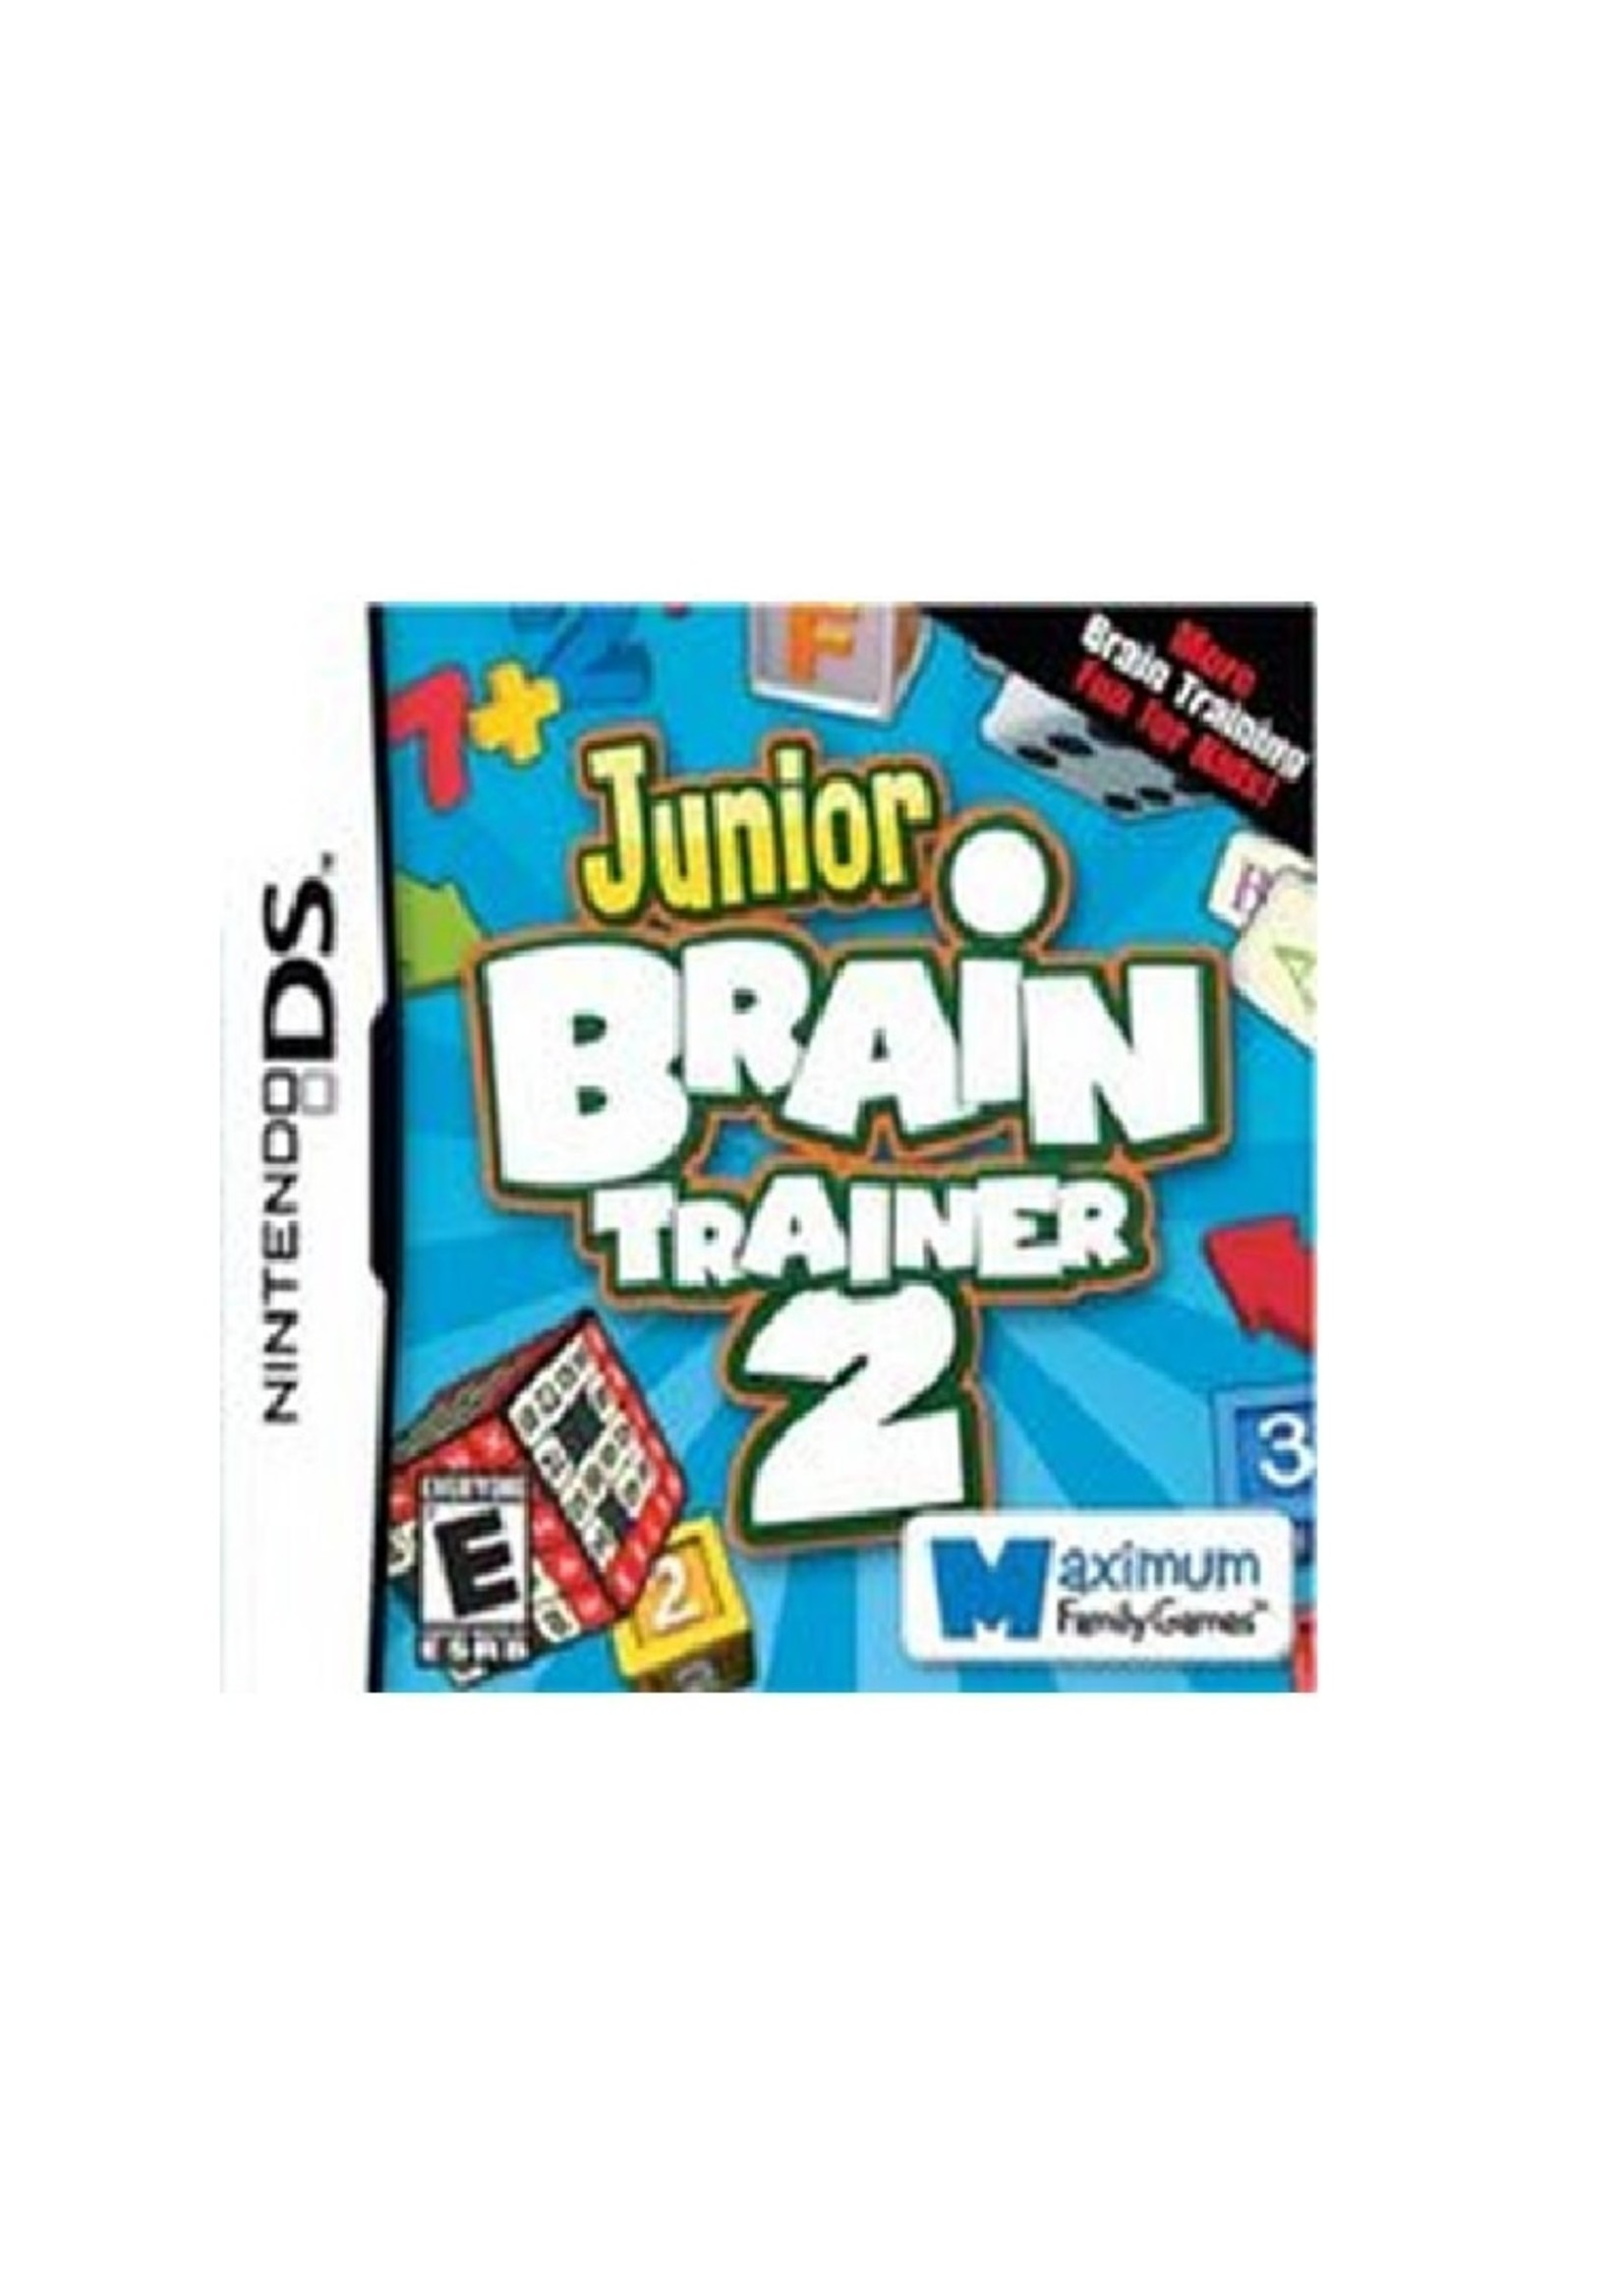 Junior Brain Trainer 2 - NDS PrePlayed